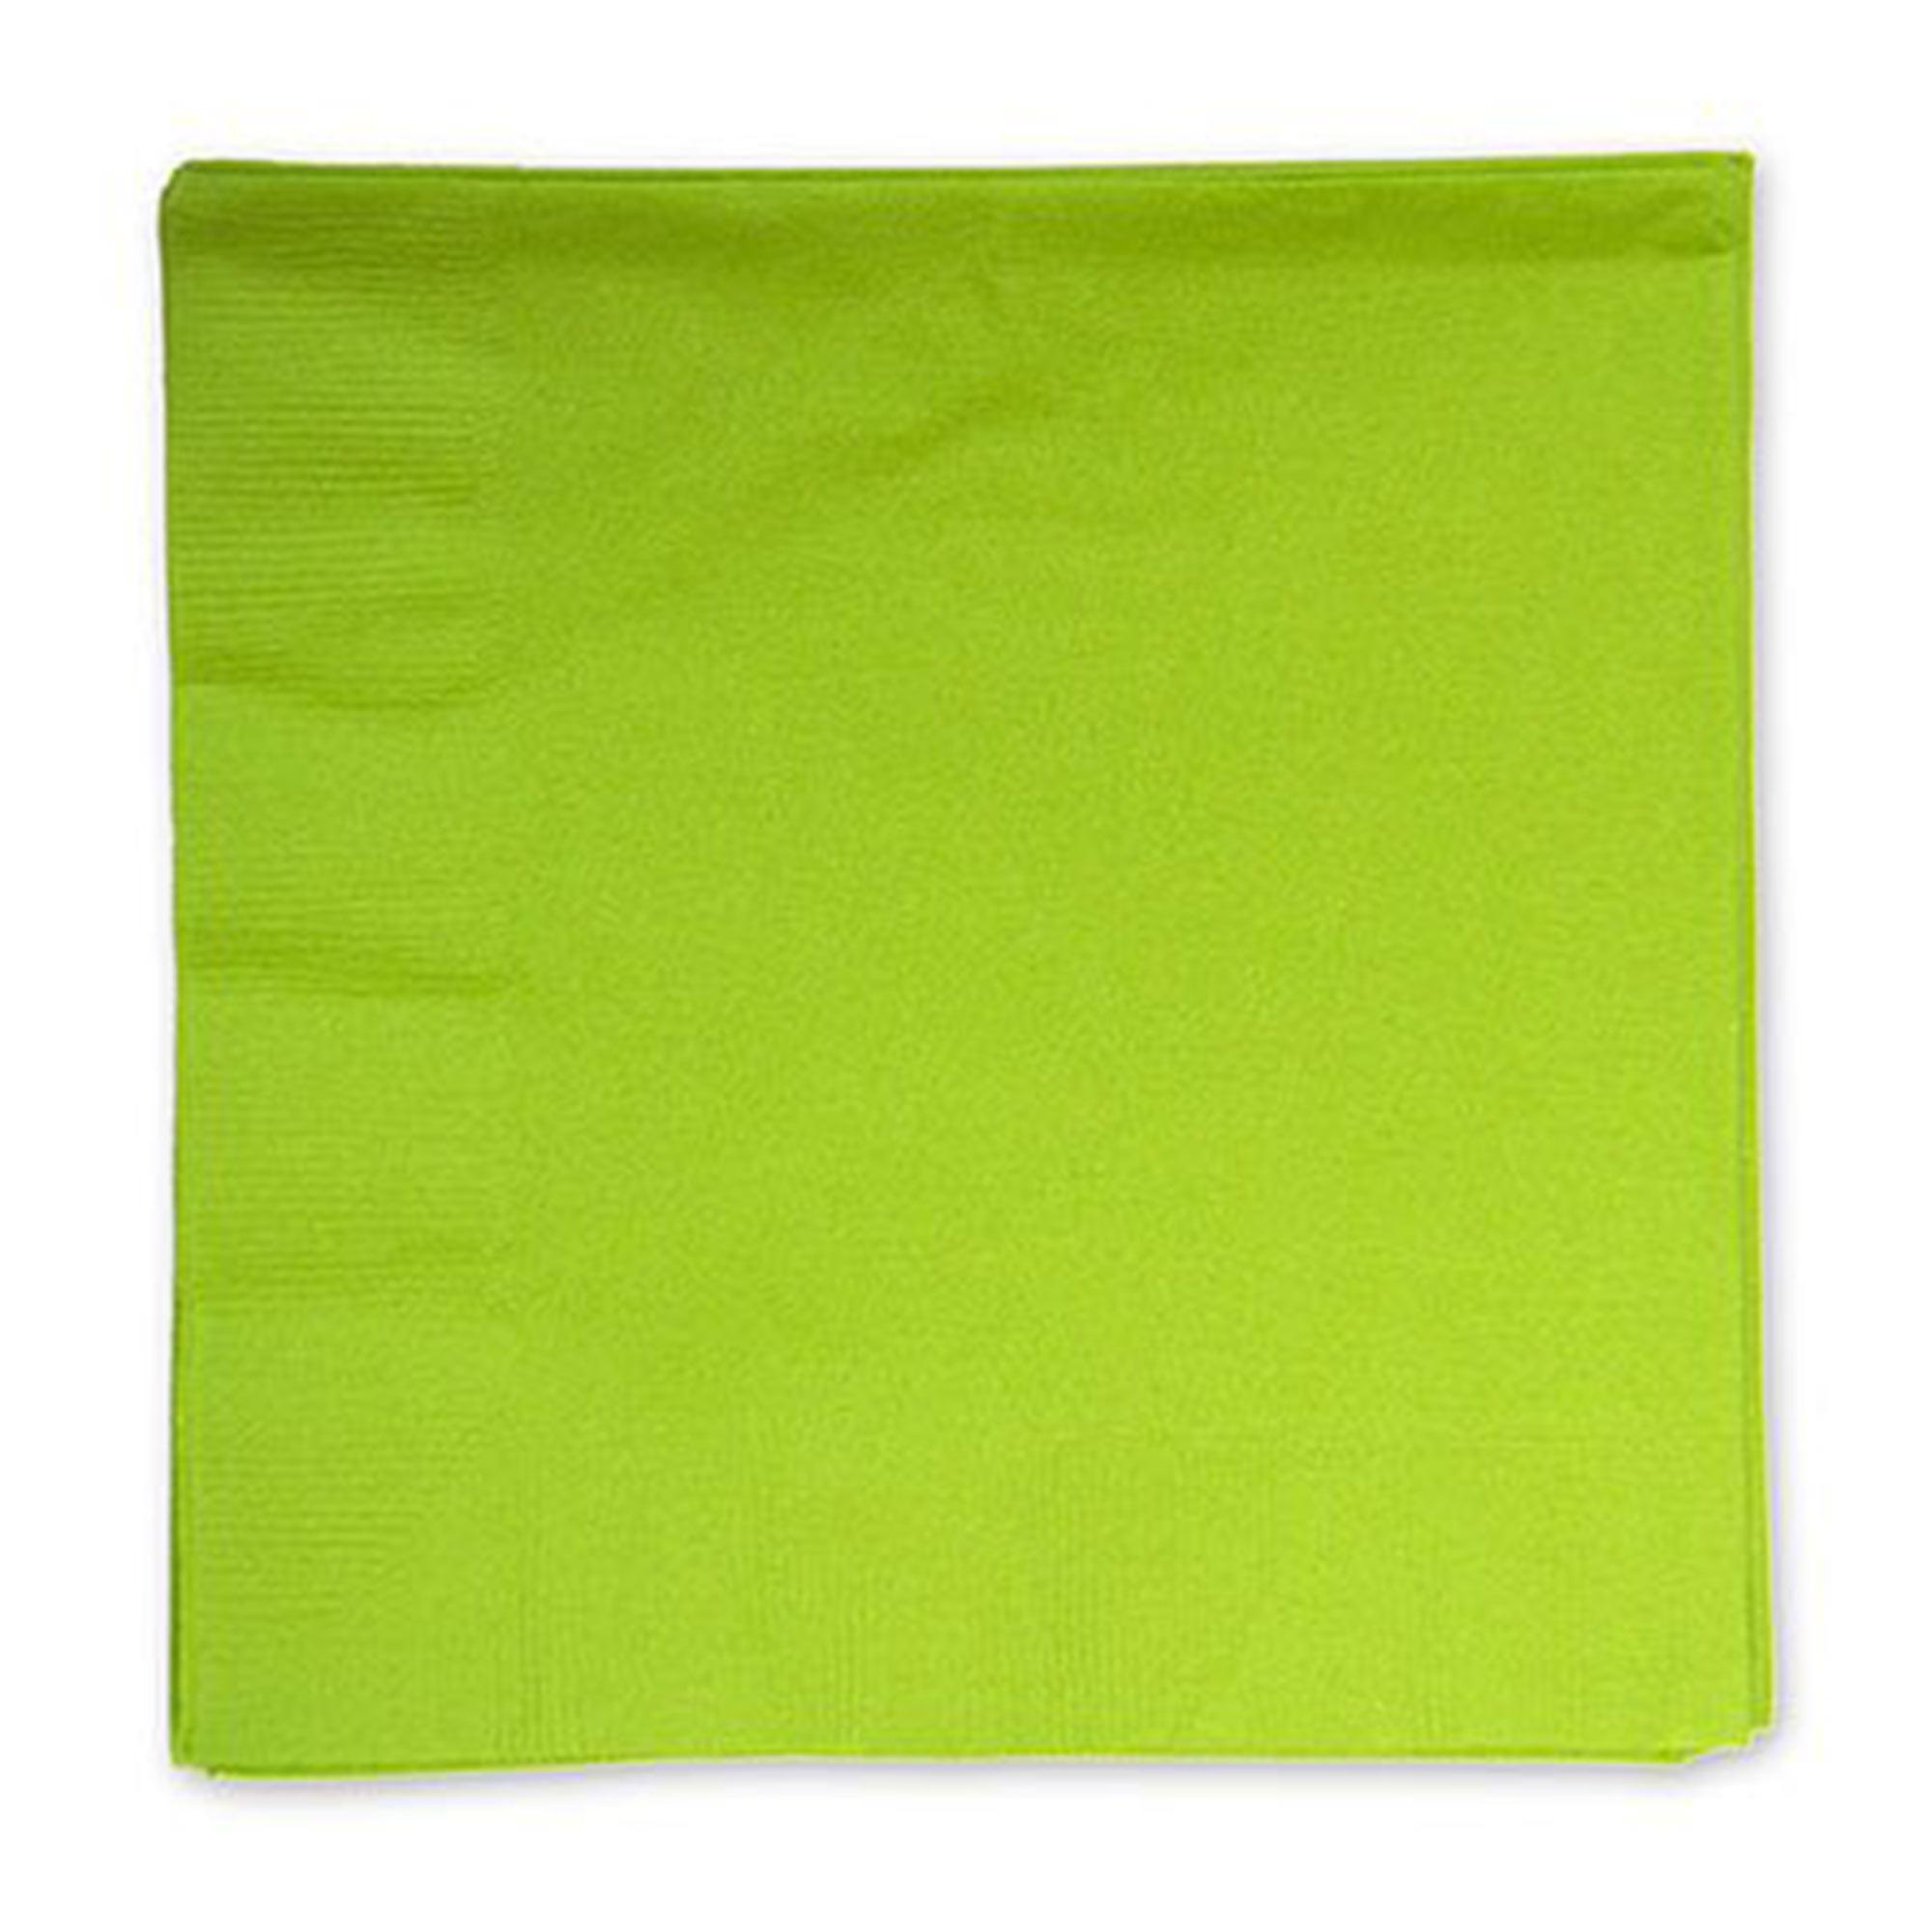 Фото - Салфетки Amscan Kiwi Green 33 см 16 шт спирали amscan пастель 55 см 12 шт